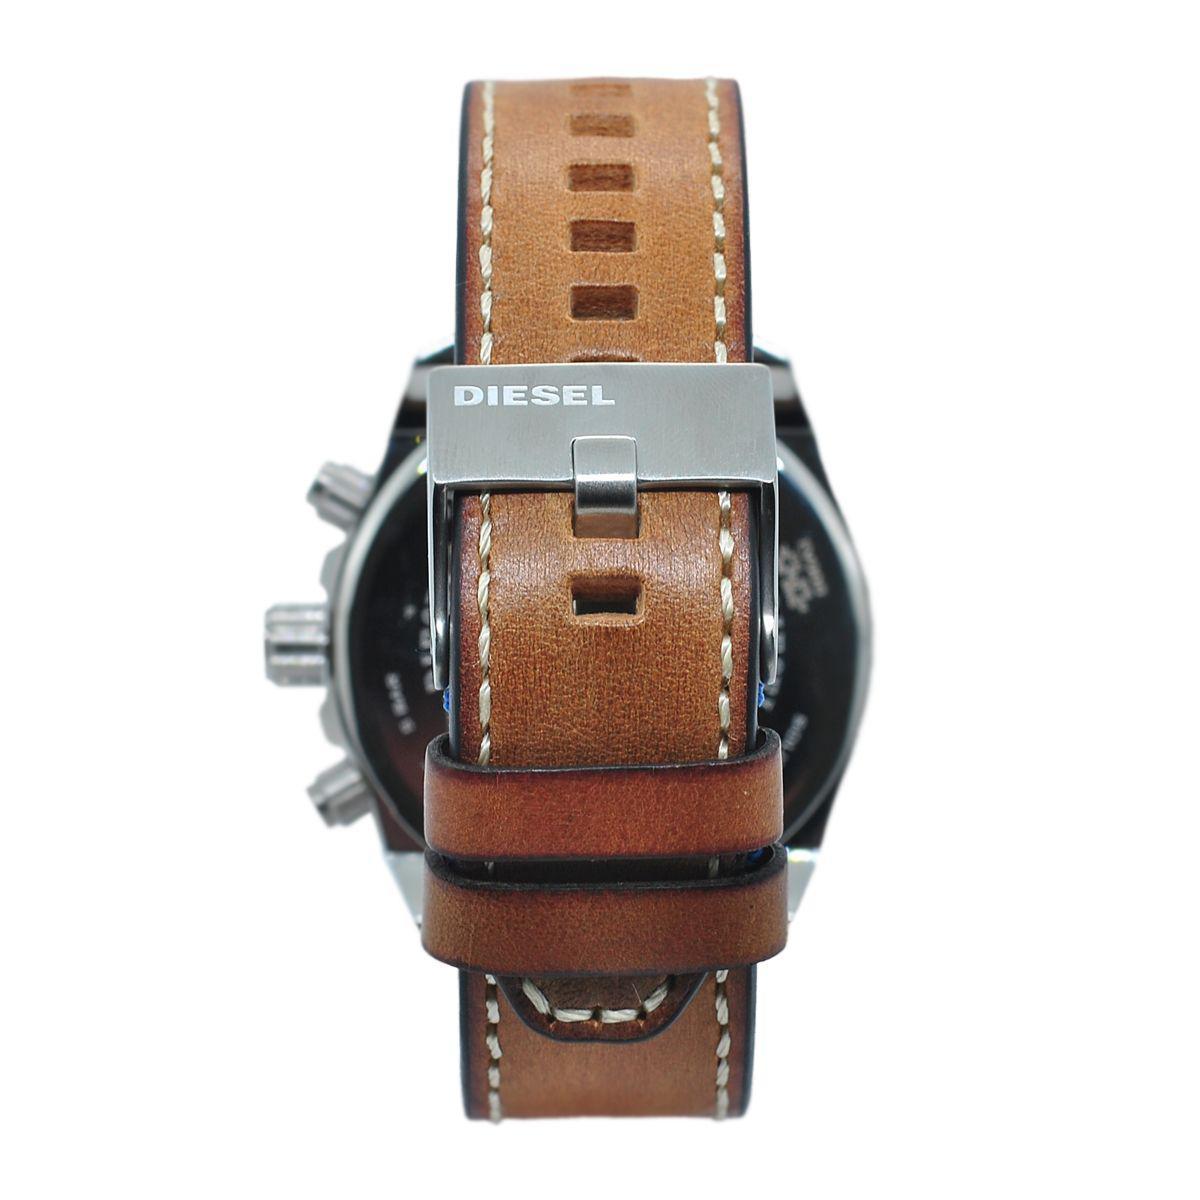 0d0835b33cc Relógio de Pulso Diesel Stand Out Ms9 Chrono Pulseira de Couro Masculino  DZ4470 0MN R  1.474